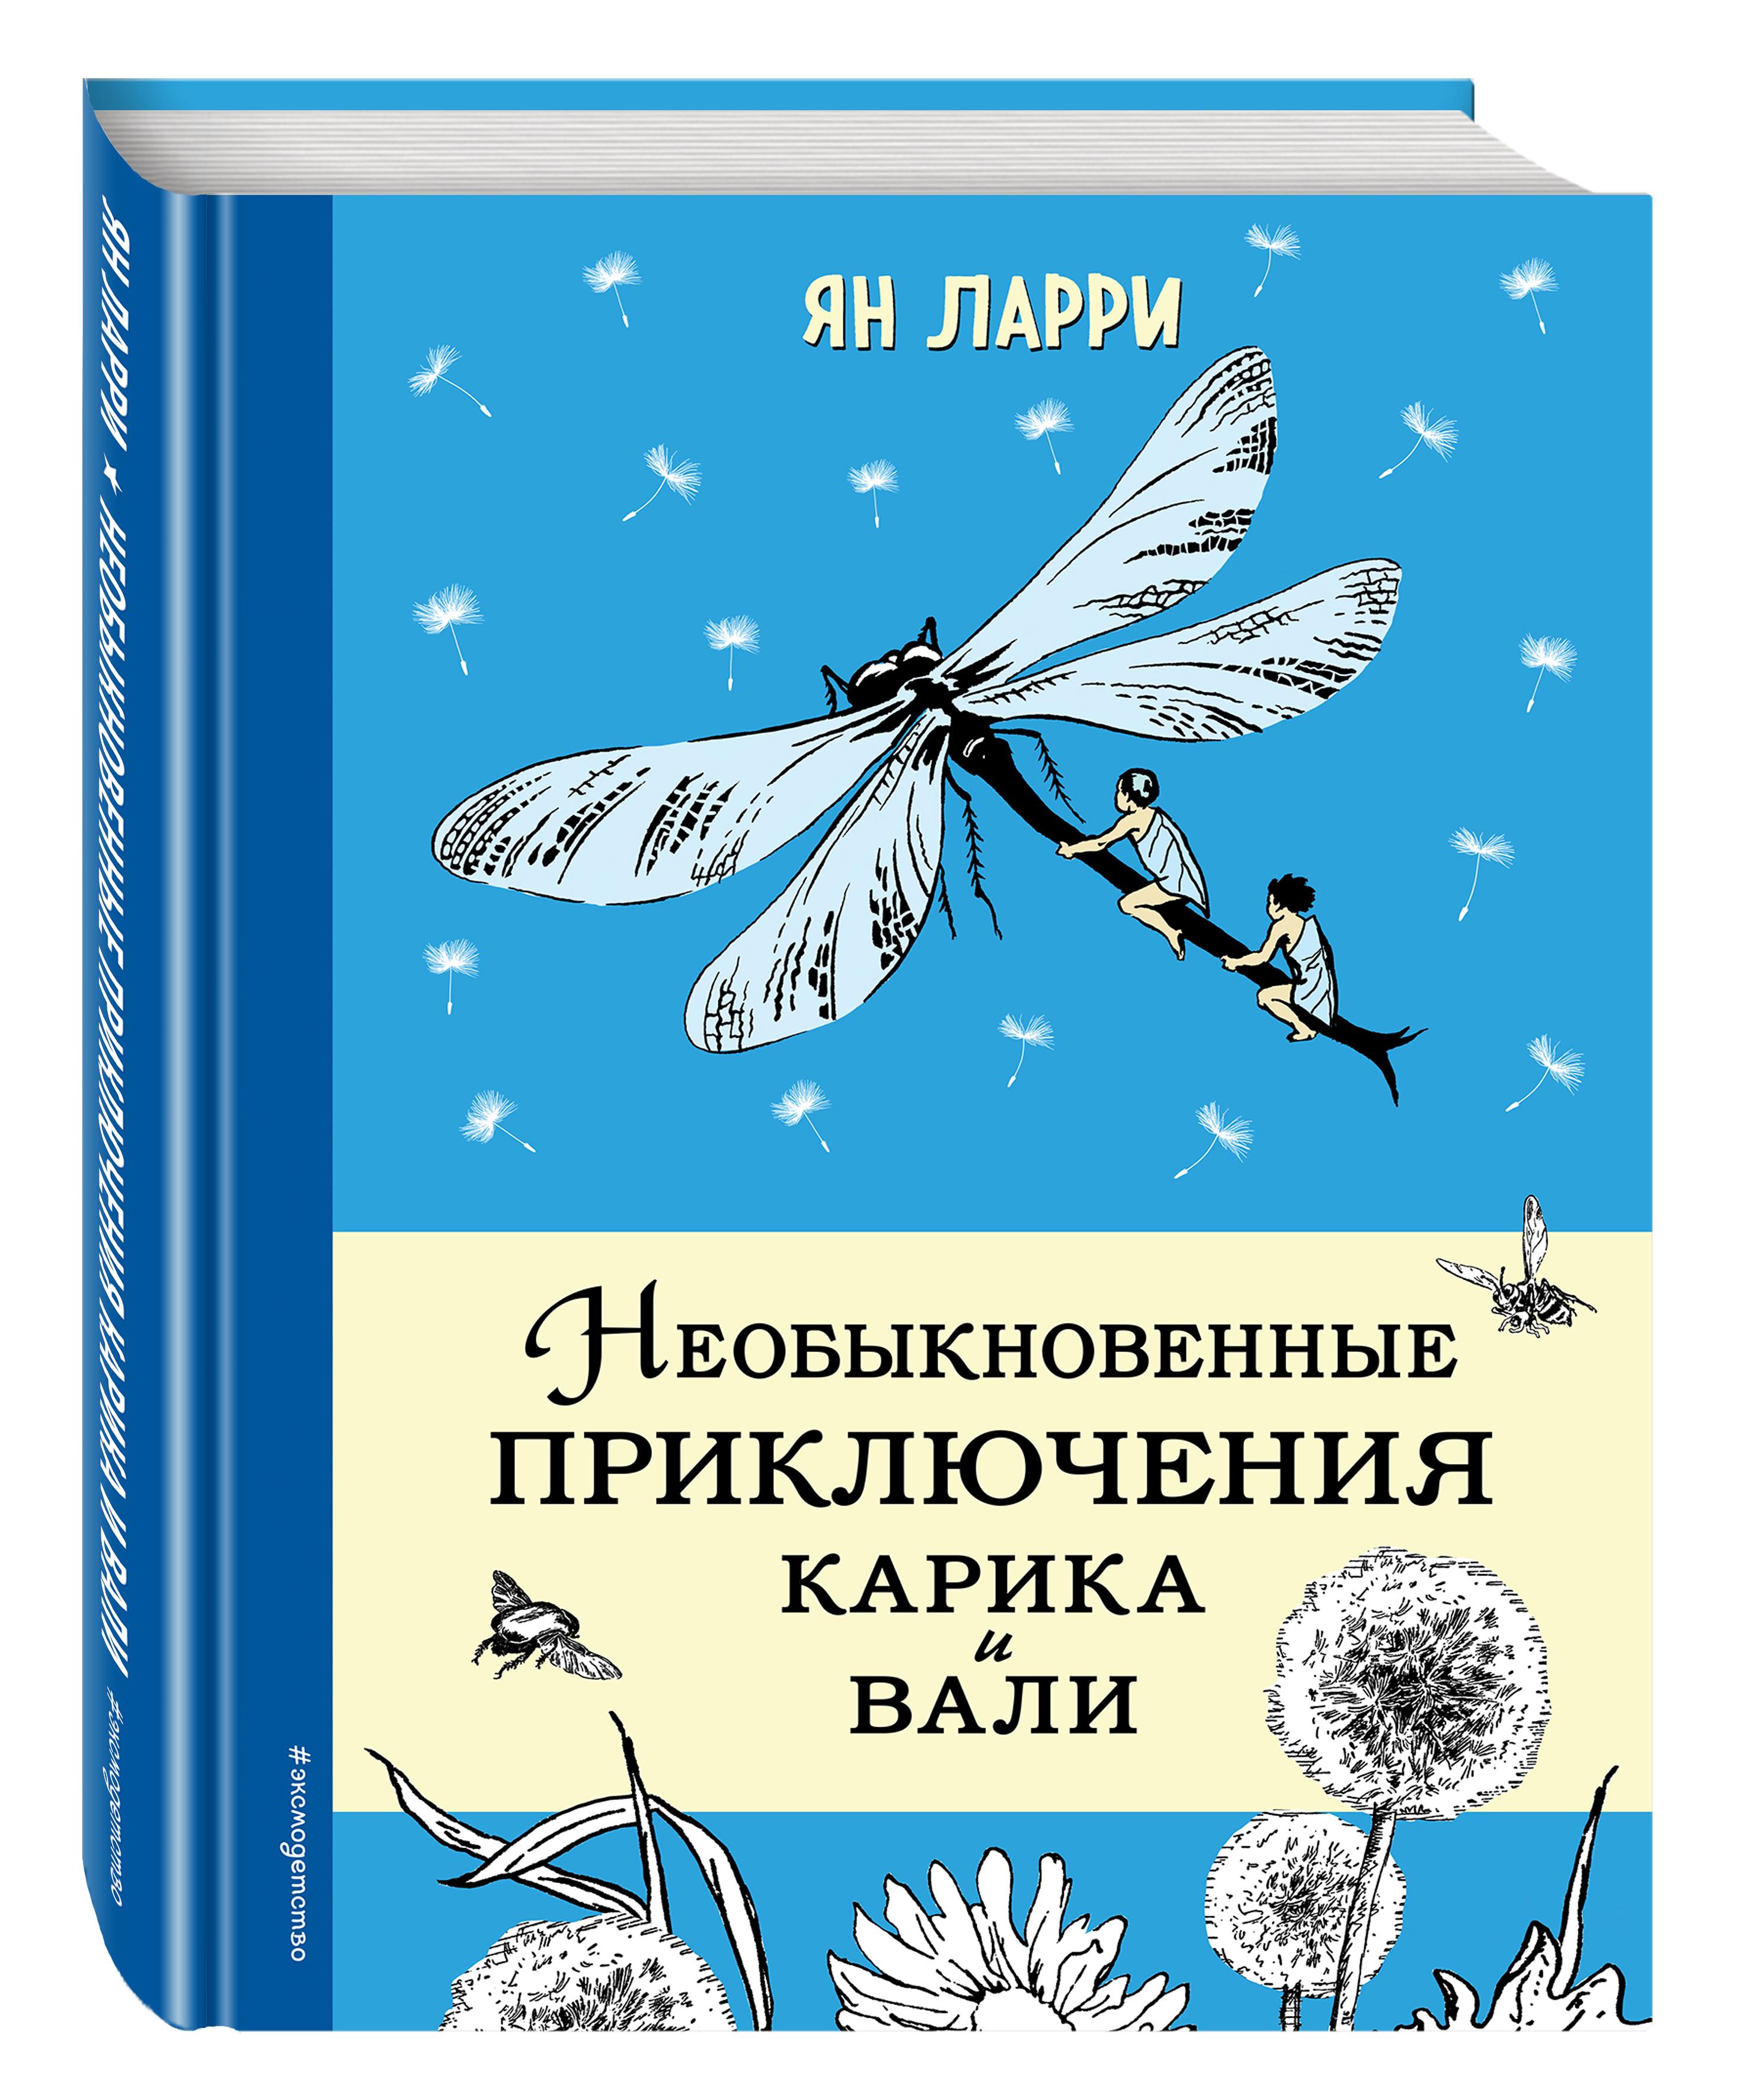 Ян Ларри Необыкновенные приключения Карика и Вали (ил. Г. Фитингофа)